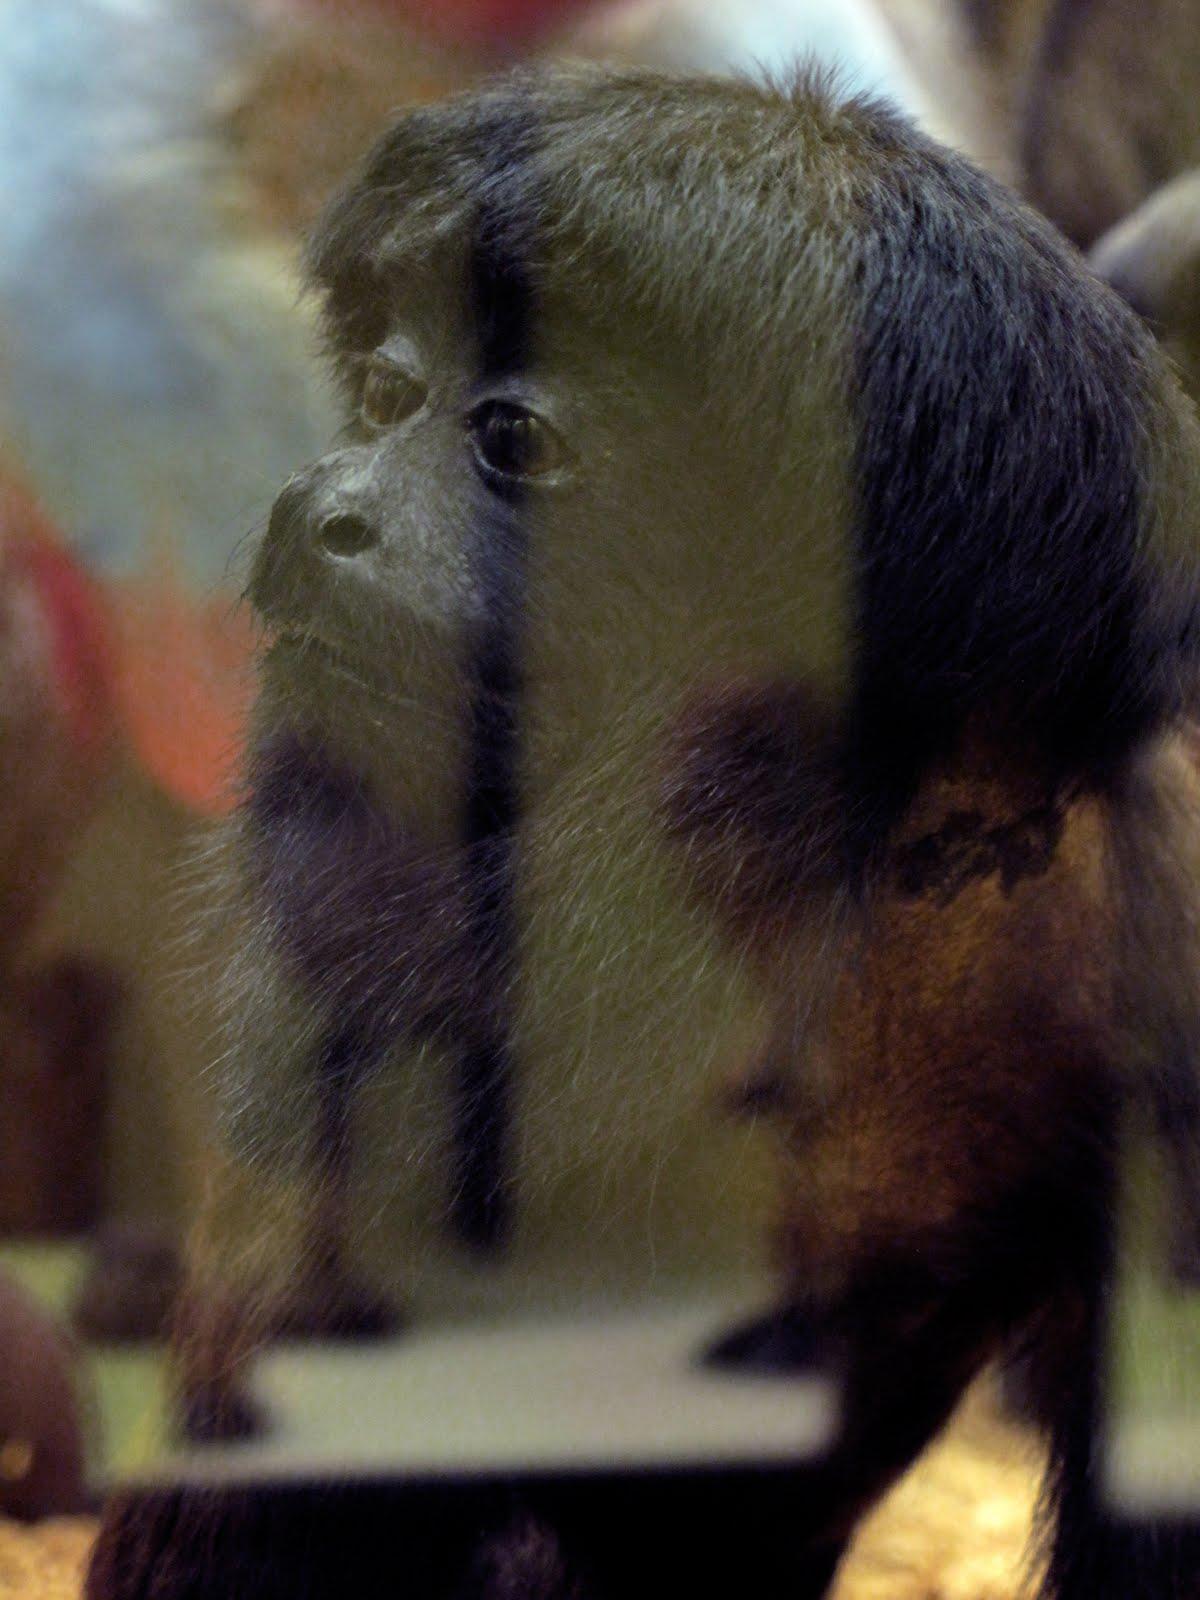 [Sincere+Monkey]